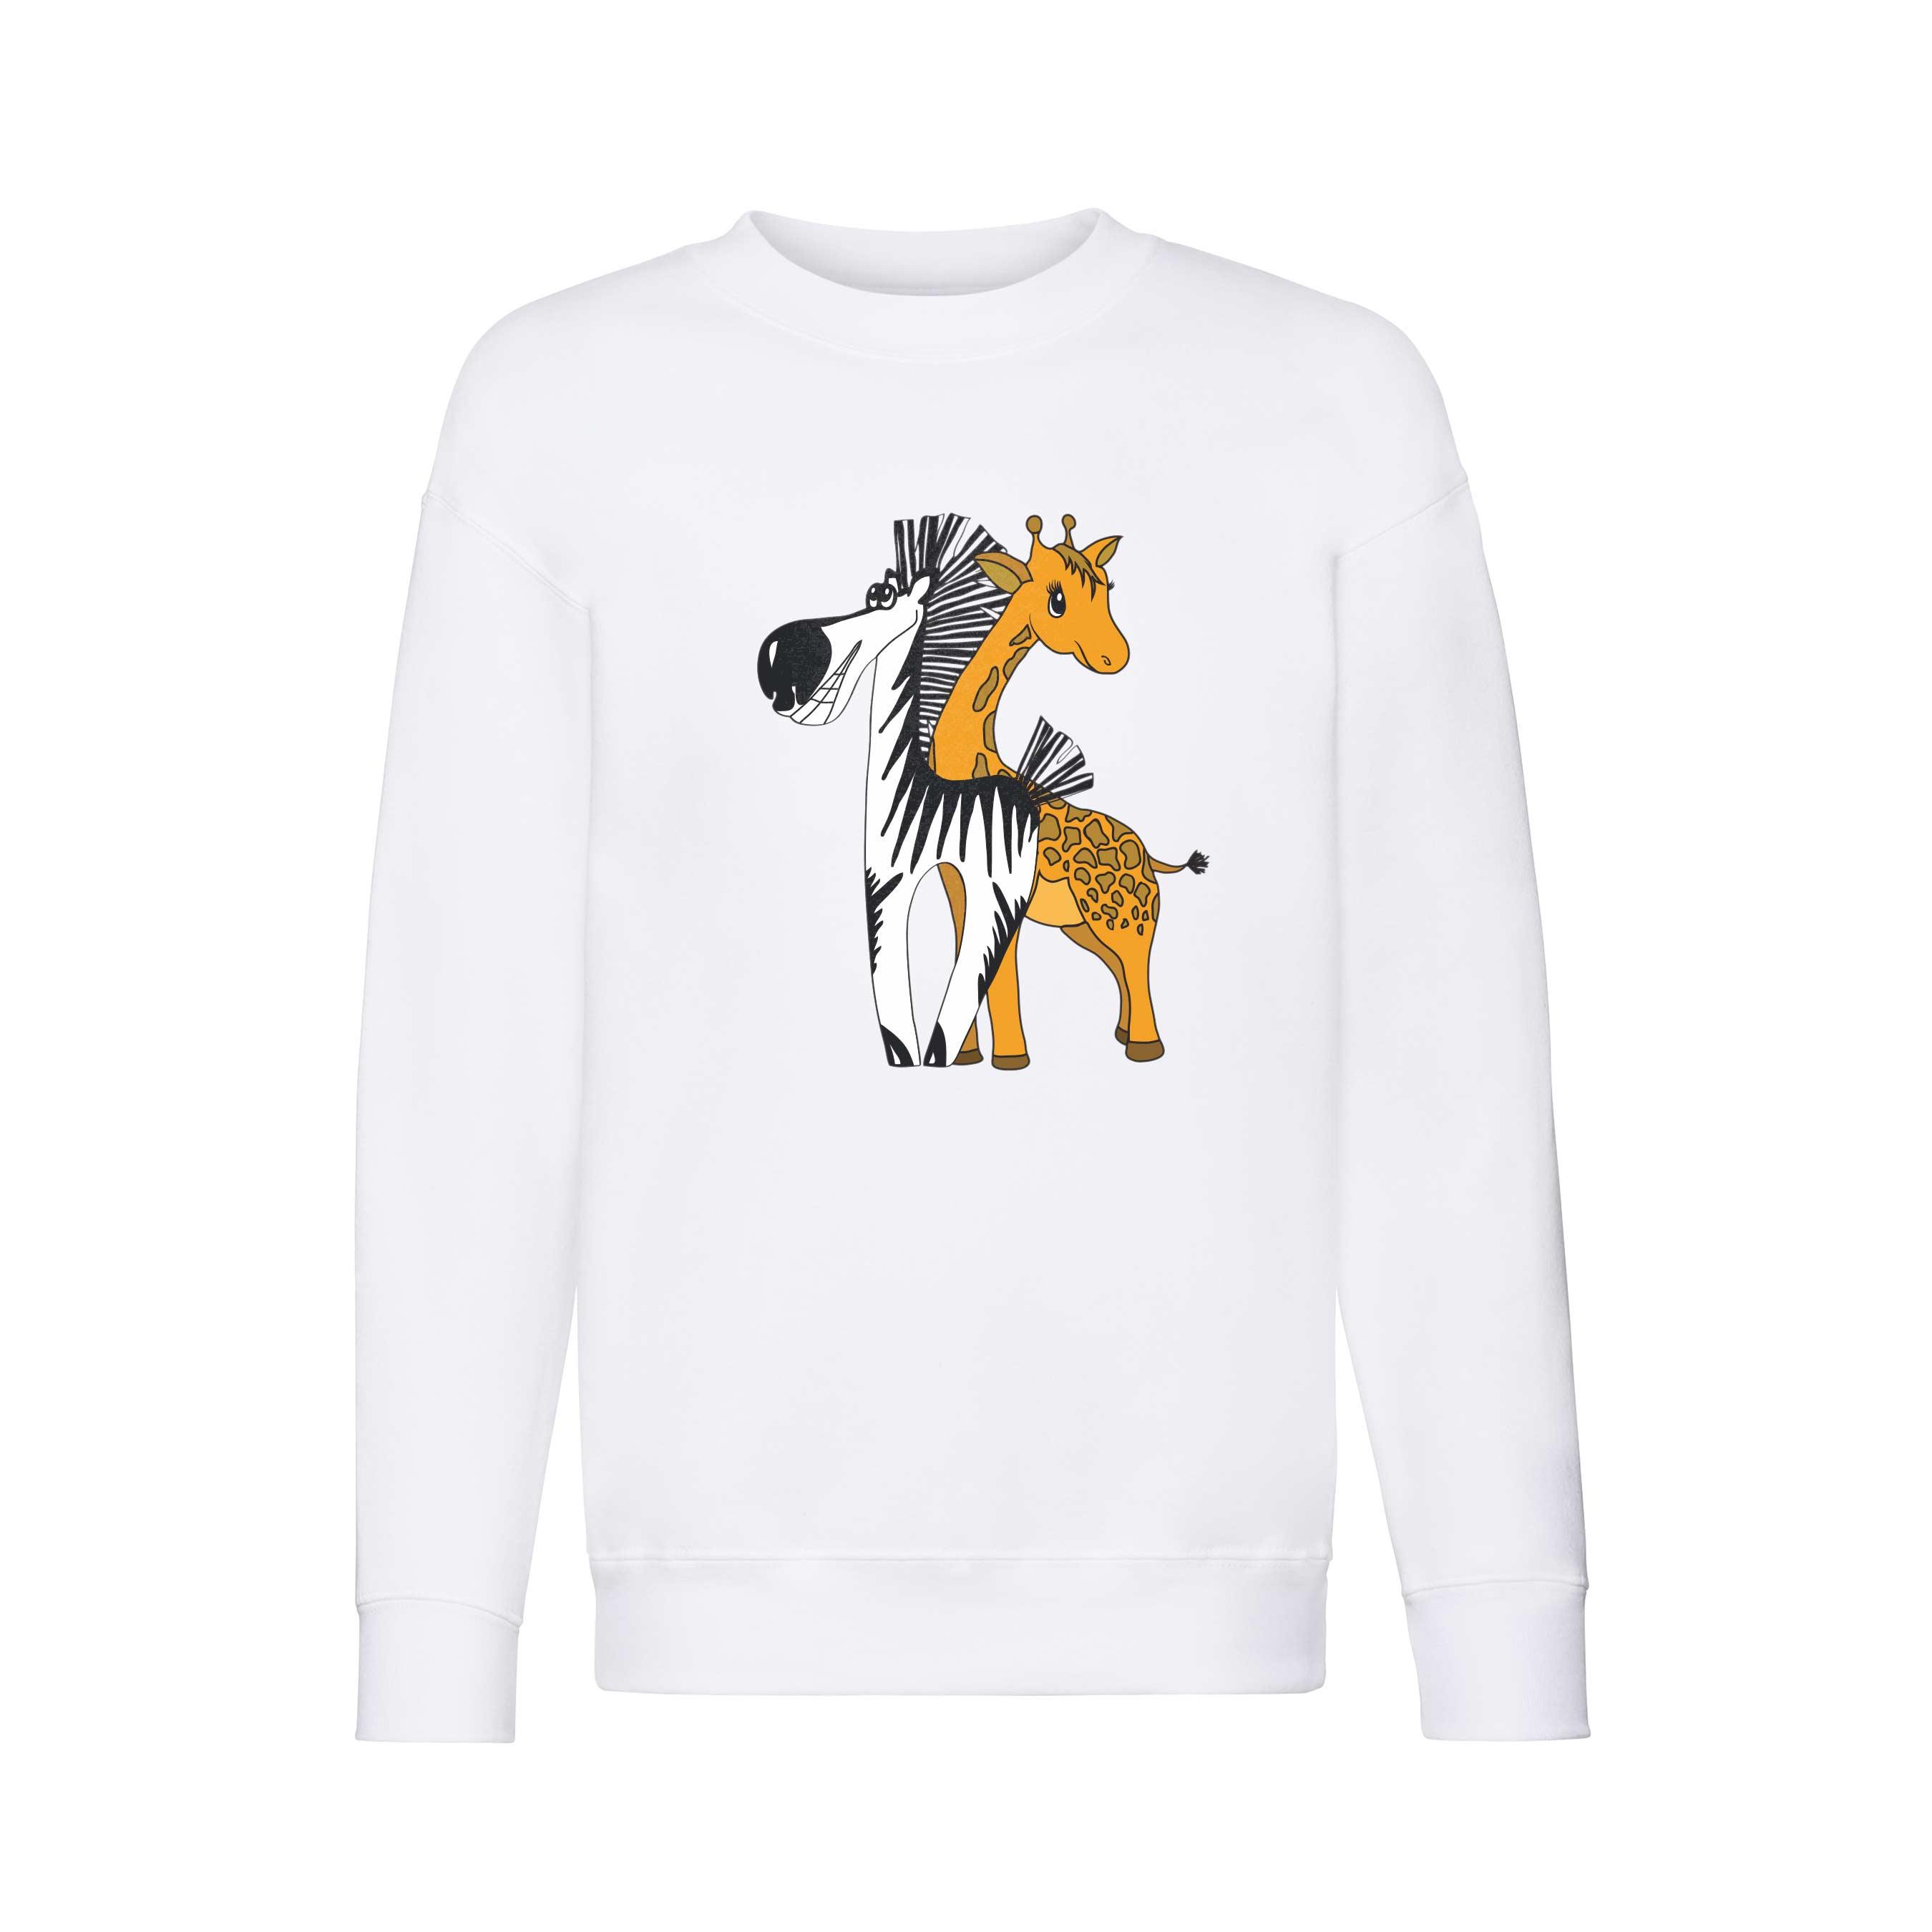 African Friends design for t-shirt, hoodie & sweatshirt